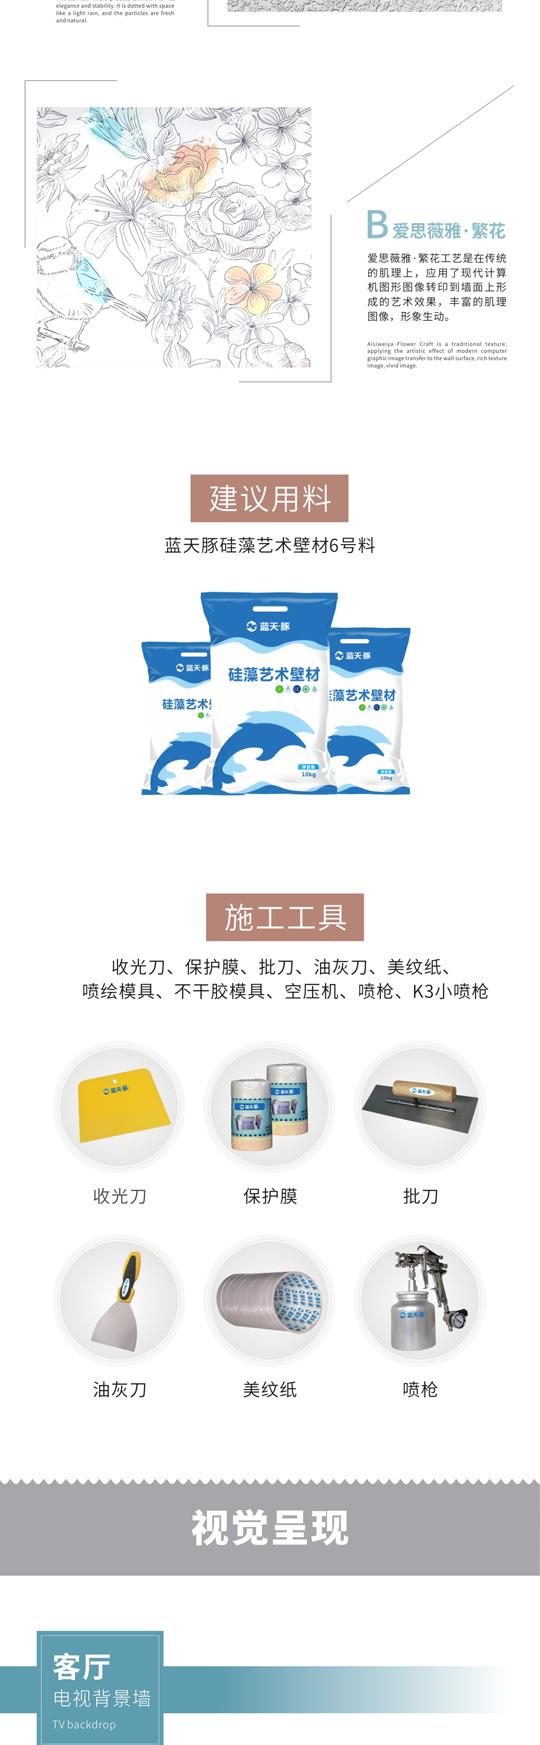 http://images4.kanbu.cn/uploads/allimg/190226/11322WA8-1.jpg